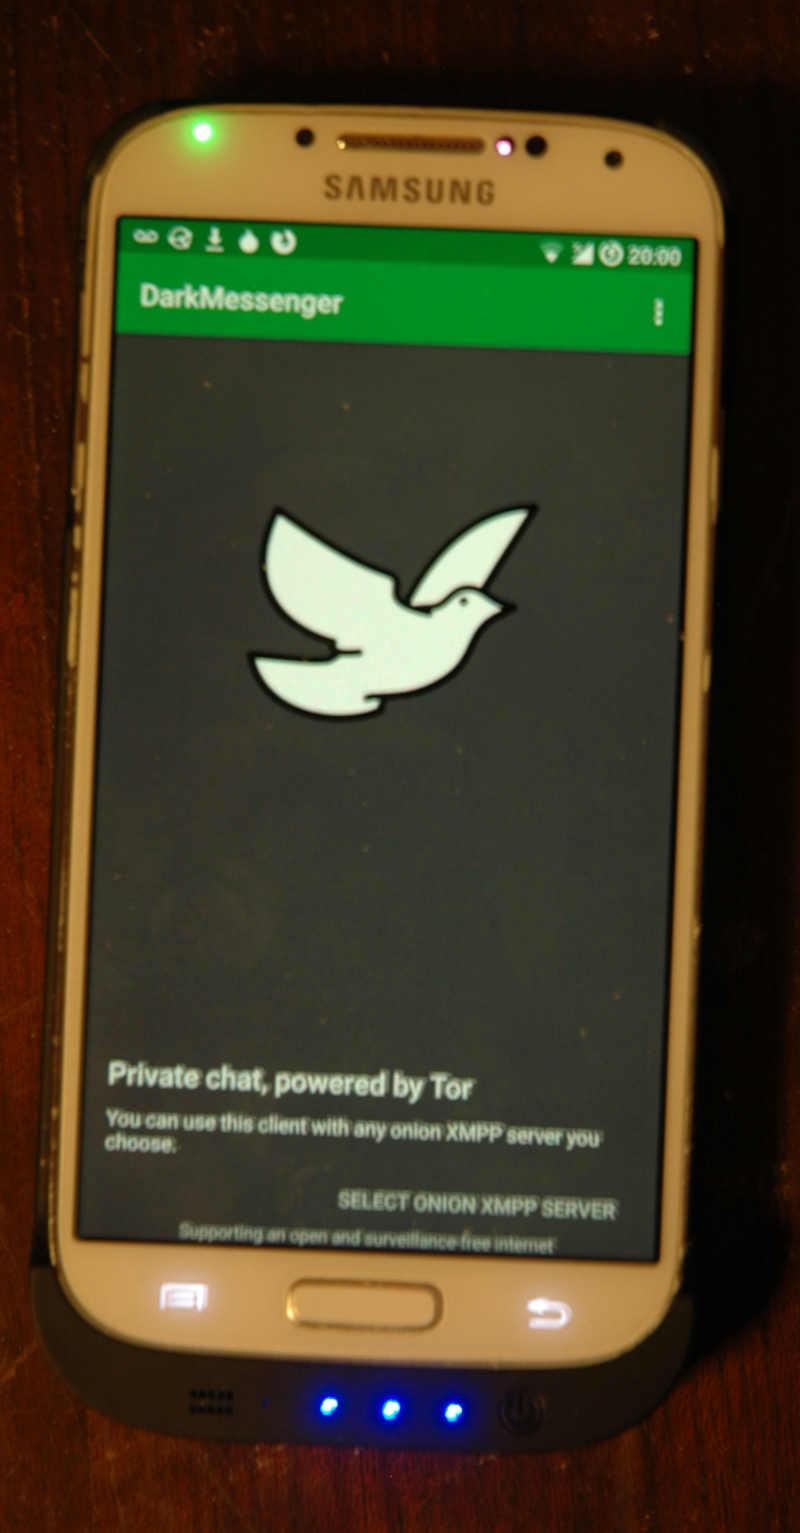 dark messenger on a mobile phone